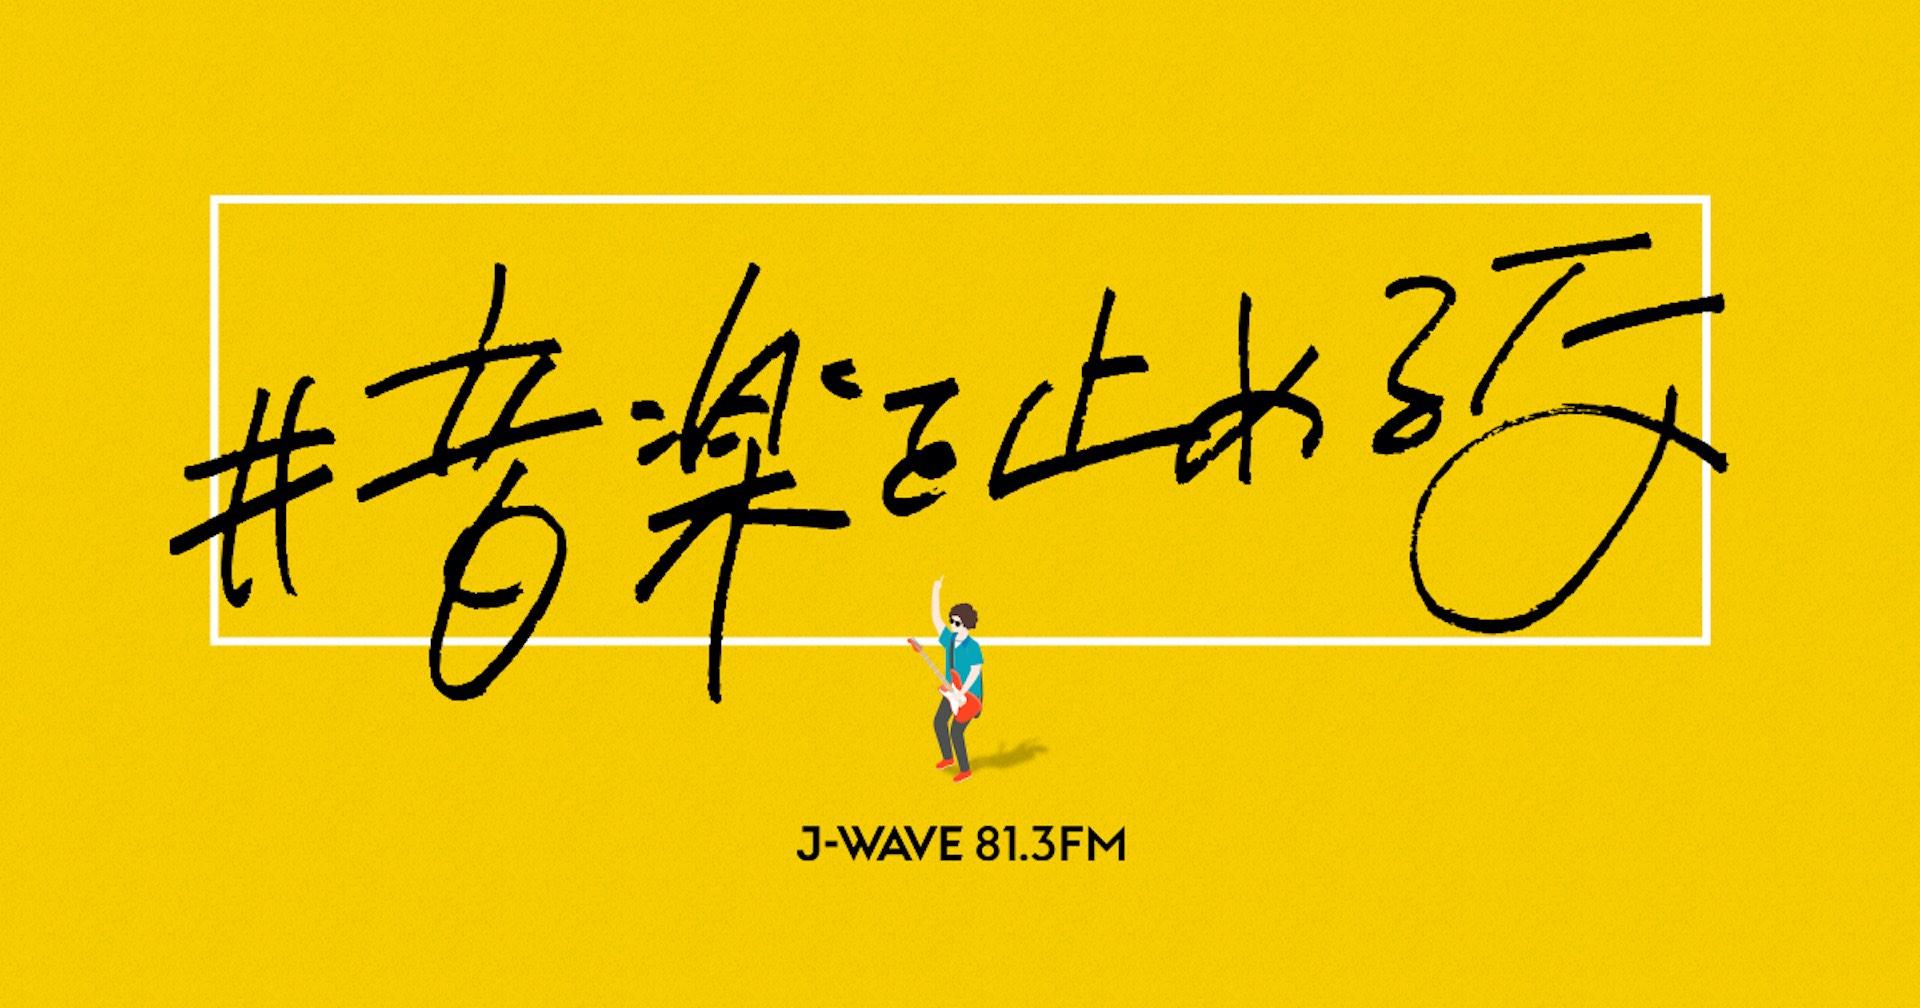 J-WAVE × BEAMS RECORDSのTシャツ第2弾が受注販売開始!本秀康、cherry chill will、TOWA TEIらが参加 music200612_jwave_beamsrecords_09